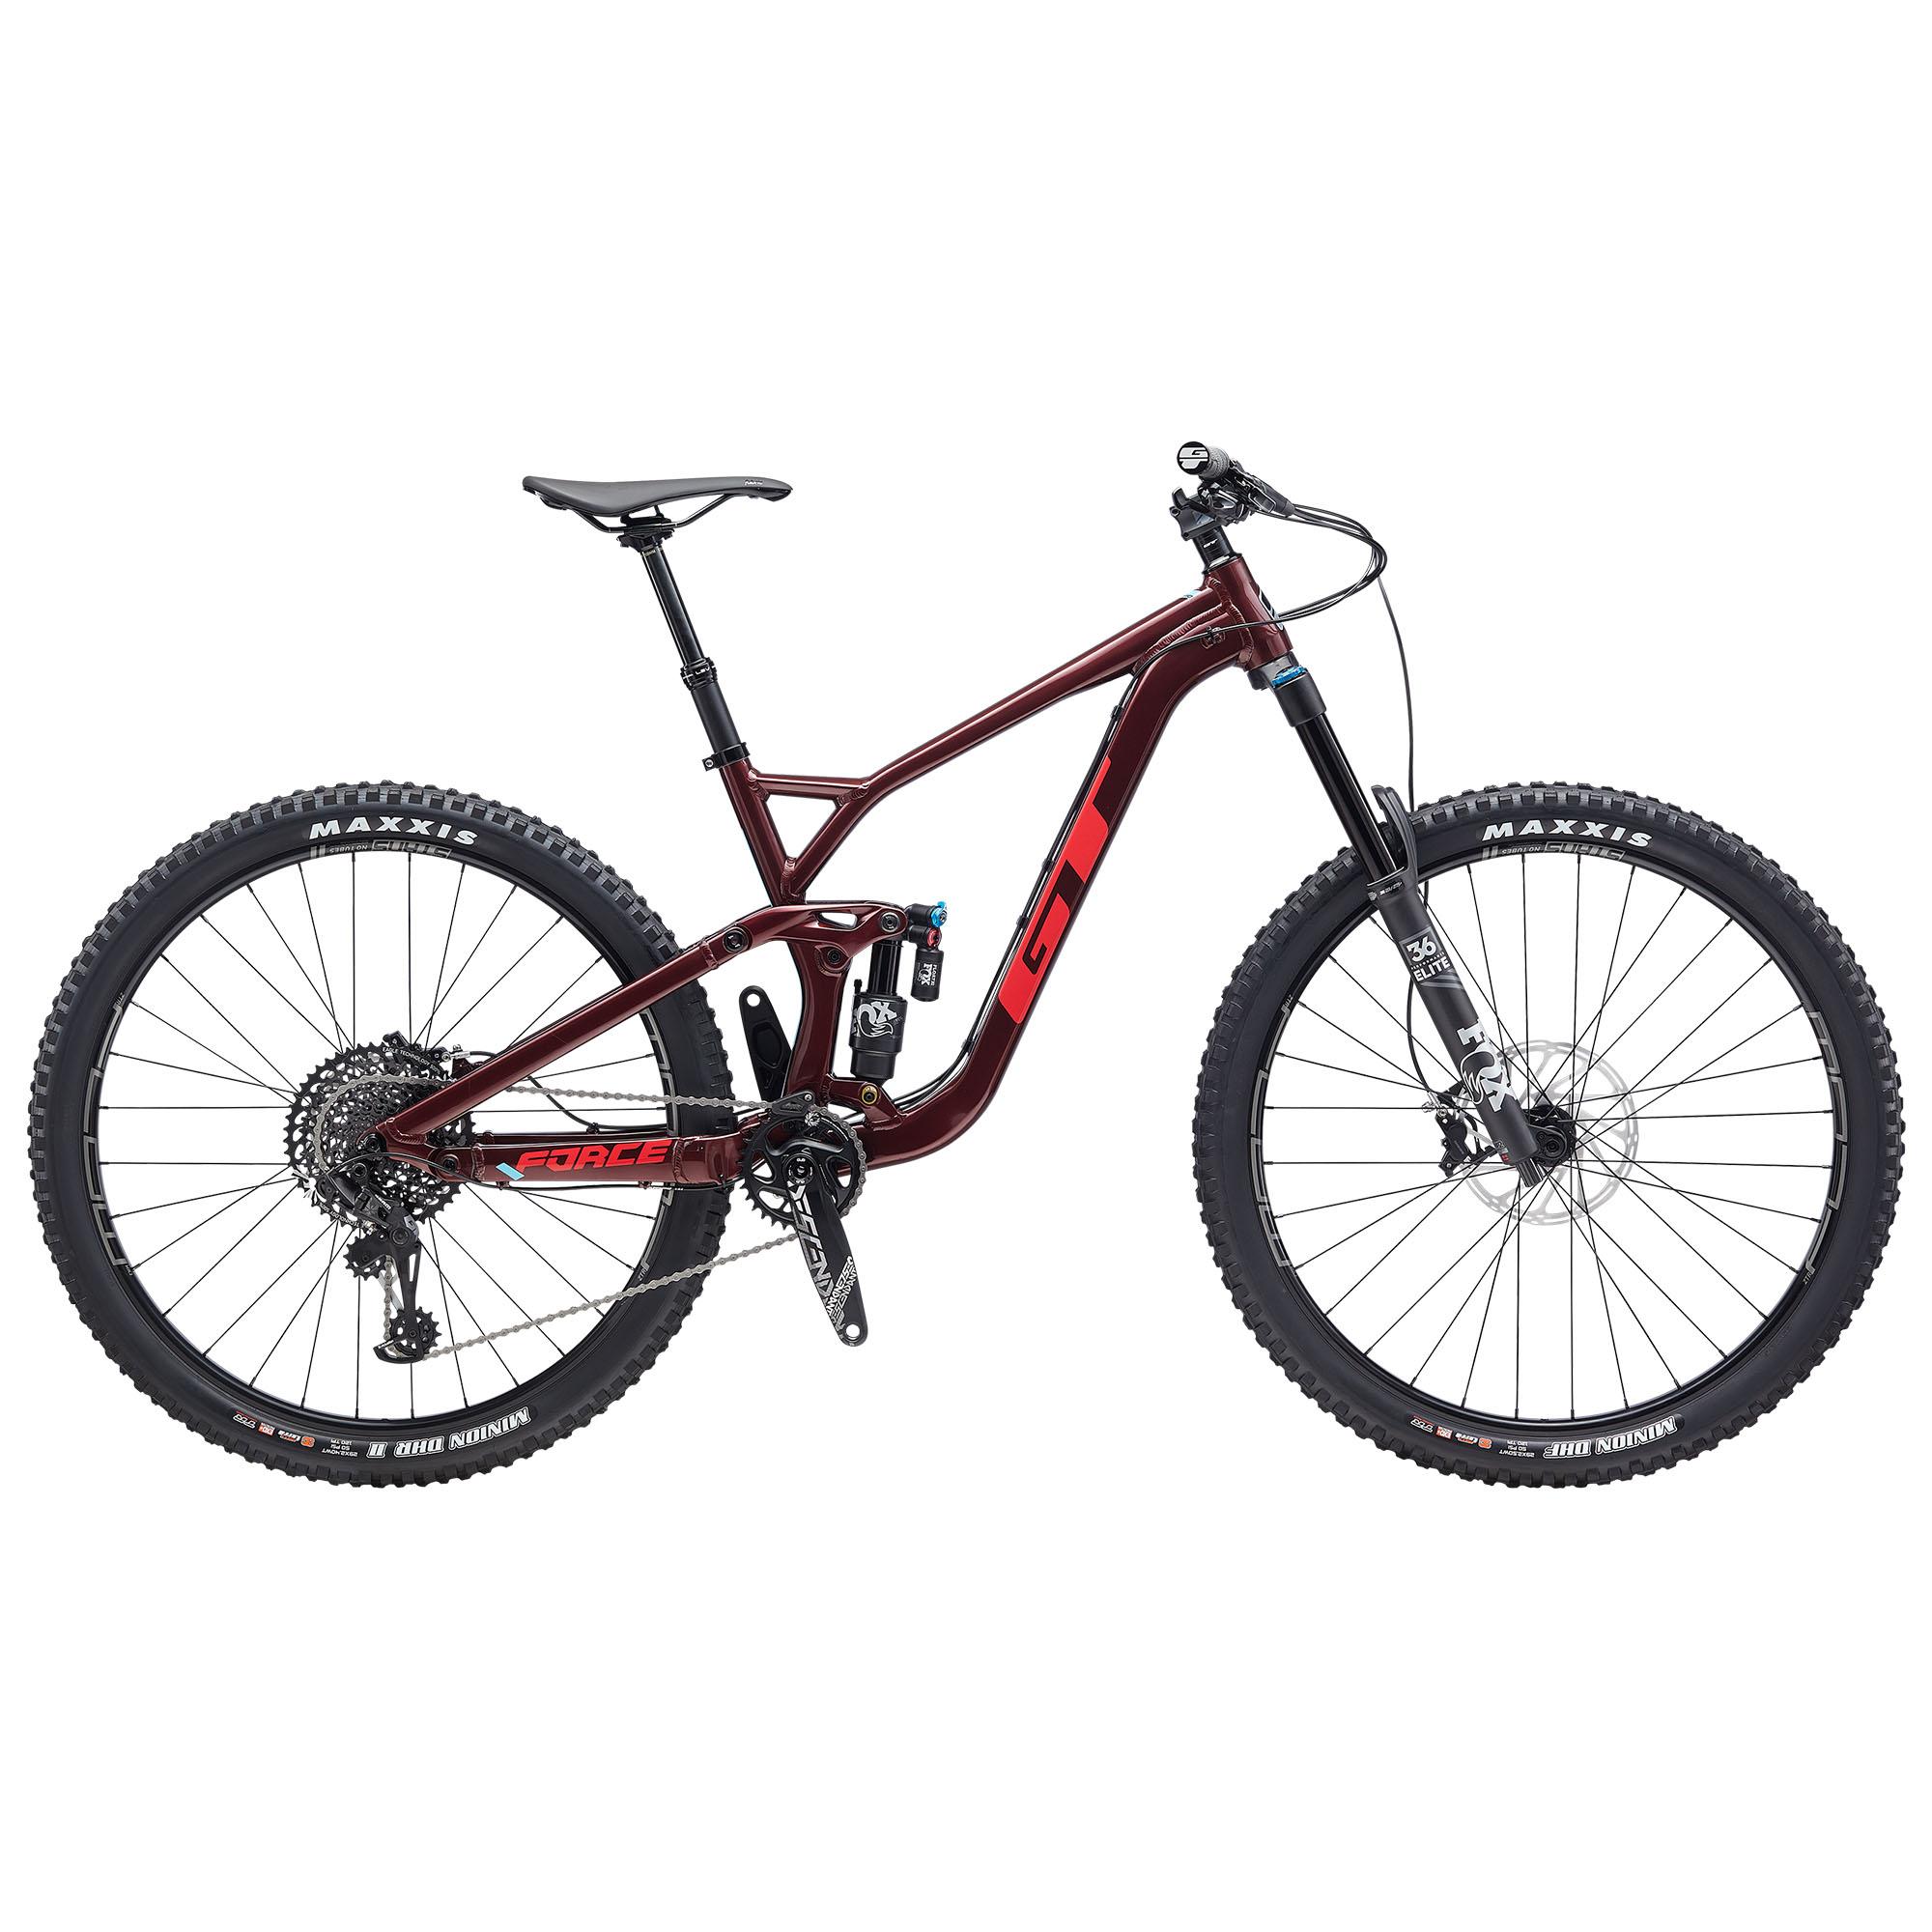 GT Bicycles Men's Force 29 Pro Mountain Bike '20 -  00038675179585